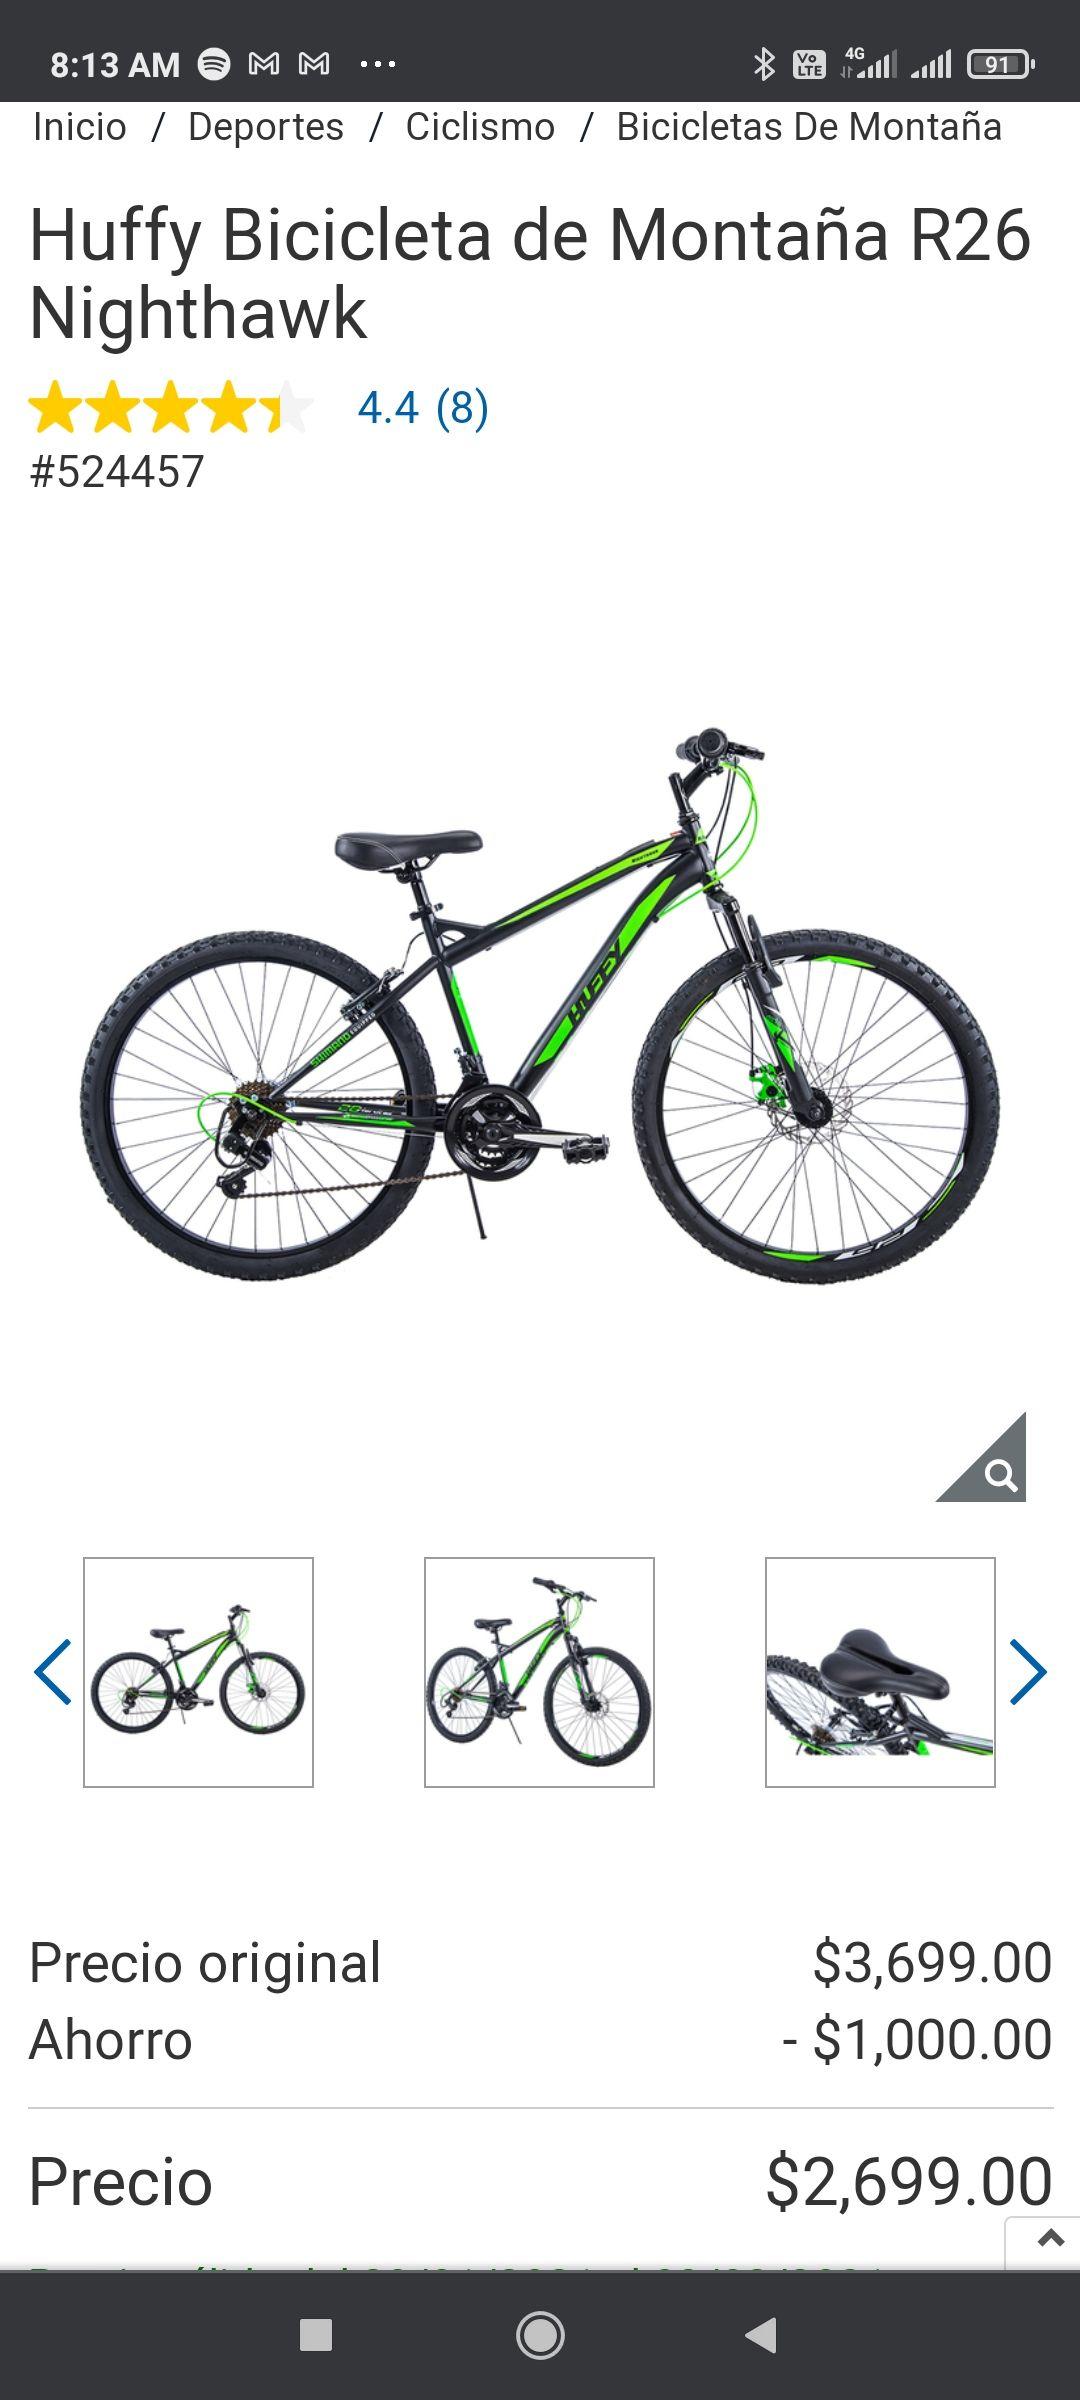 Costco Huffy Bicicleta de Montaña R26 Nighthawk